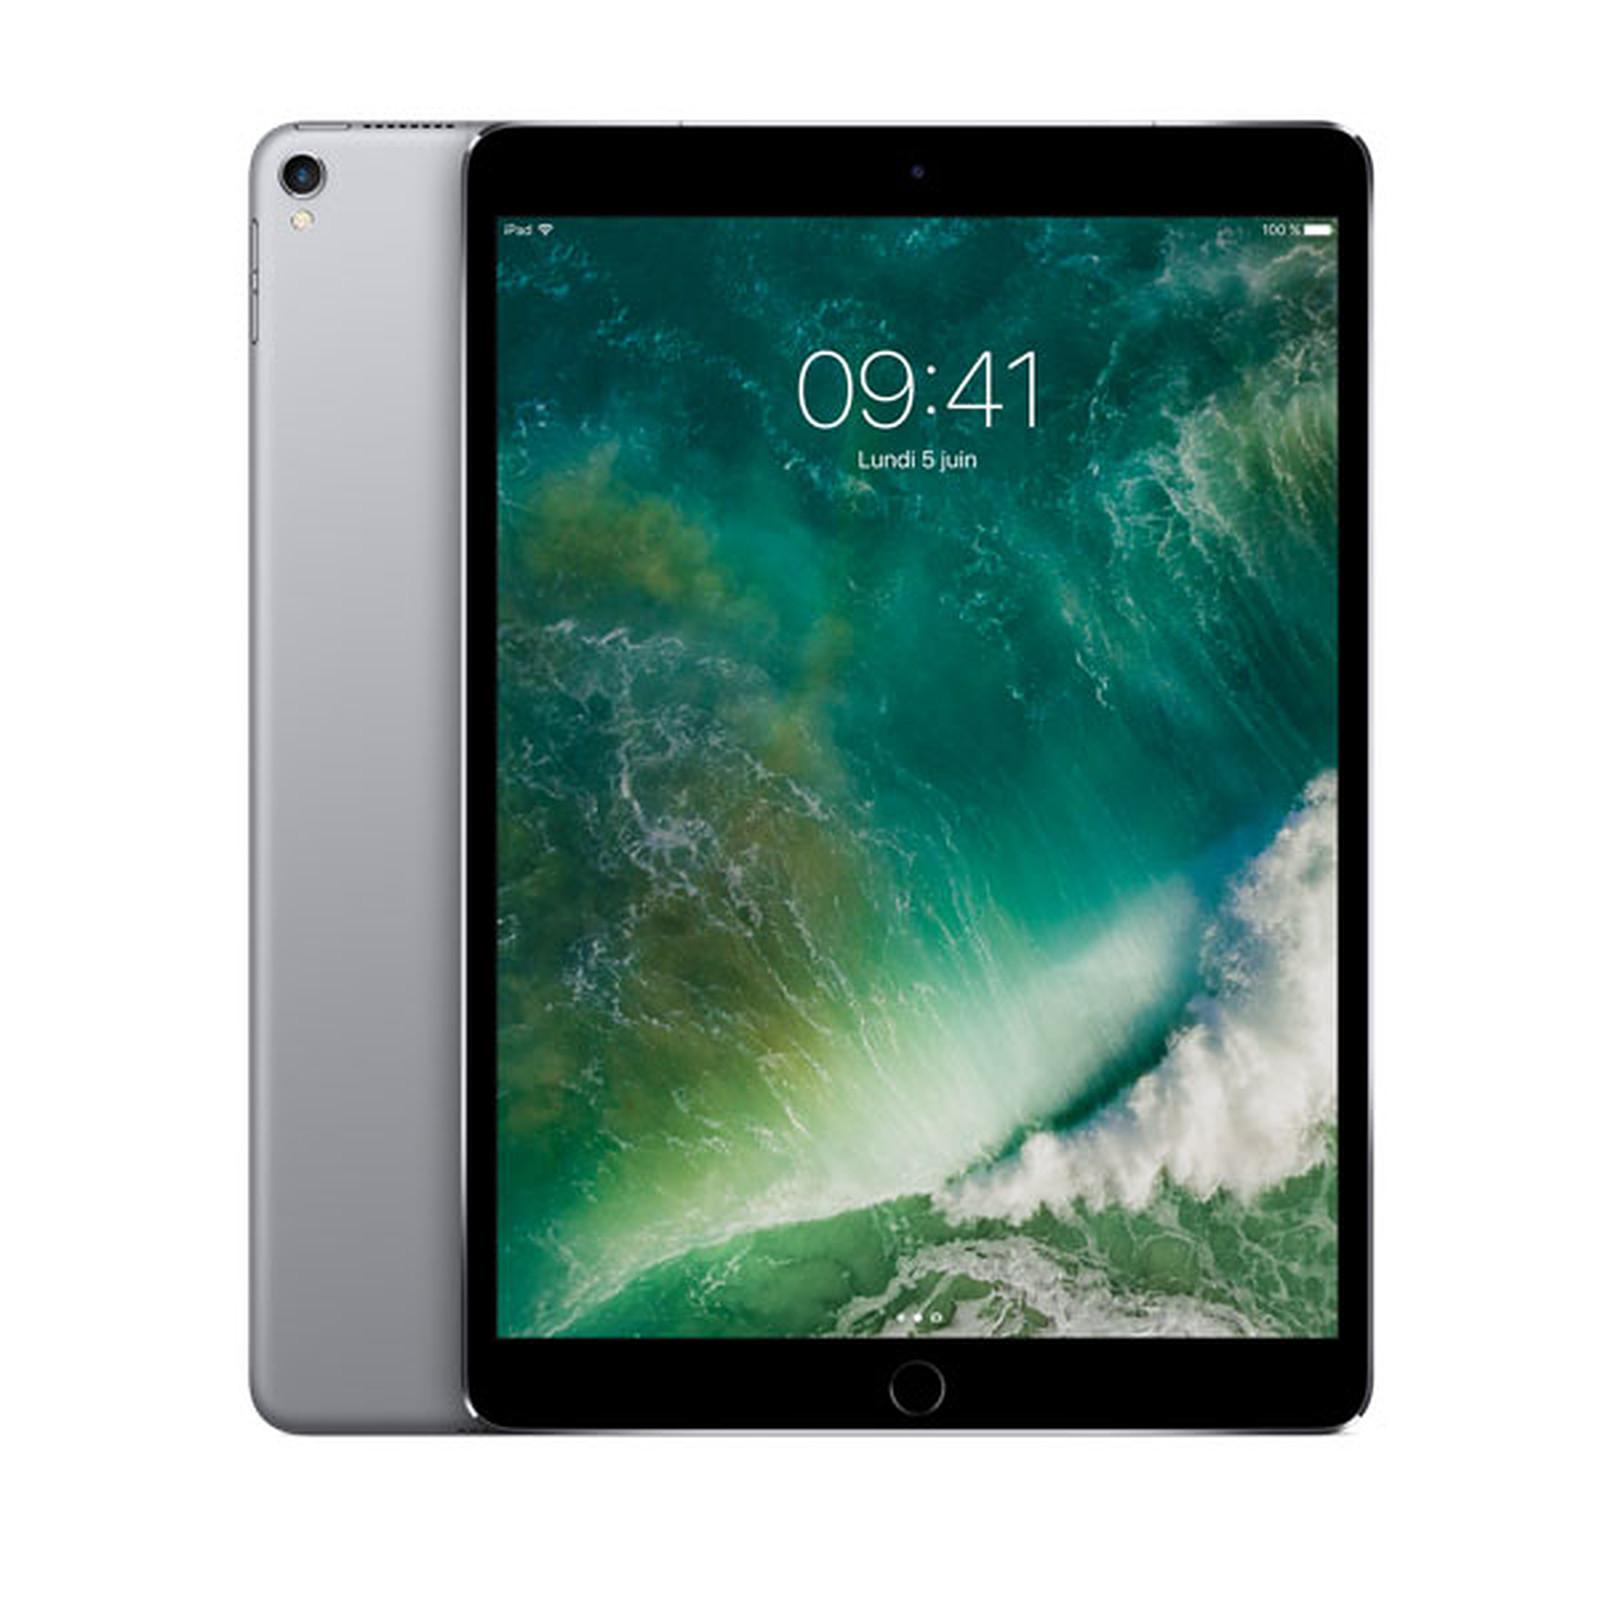 Ipad Pro 256 Go : apple ipad pro 10 5 pouces 256 go wi fi wi fi cellular ~ Pogadajmy.info Styles, Décorations et Voitures